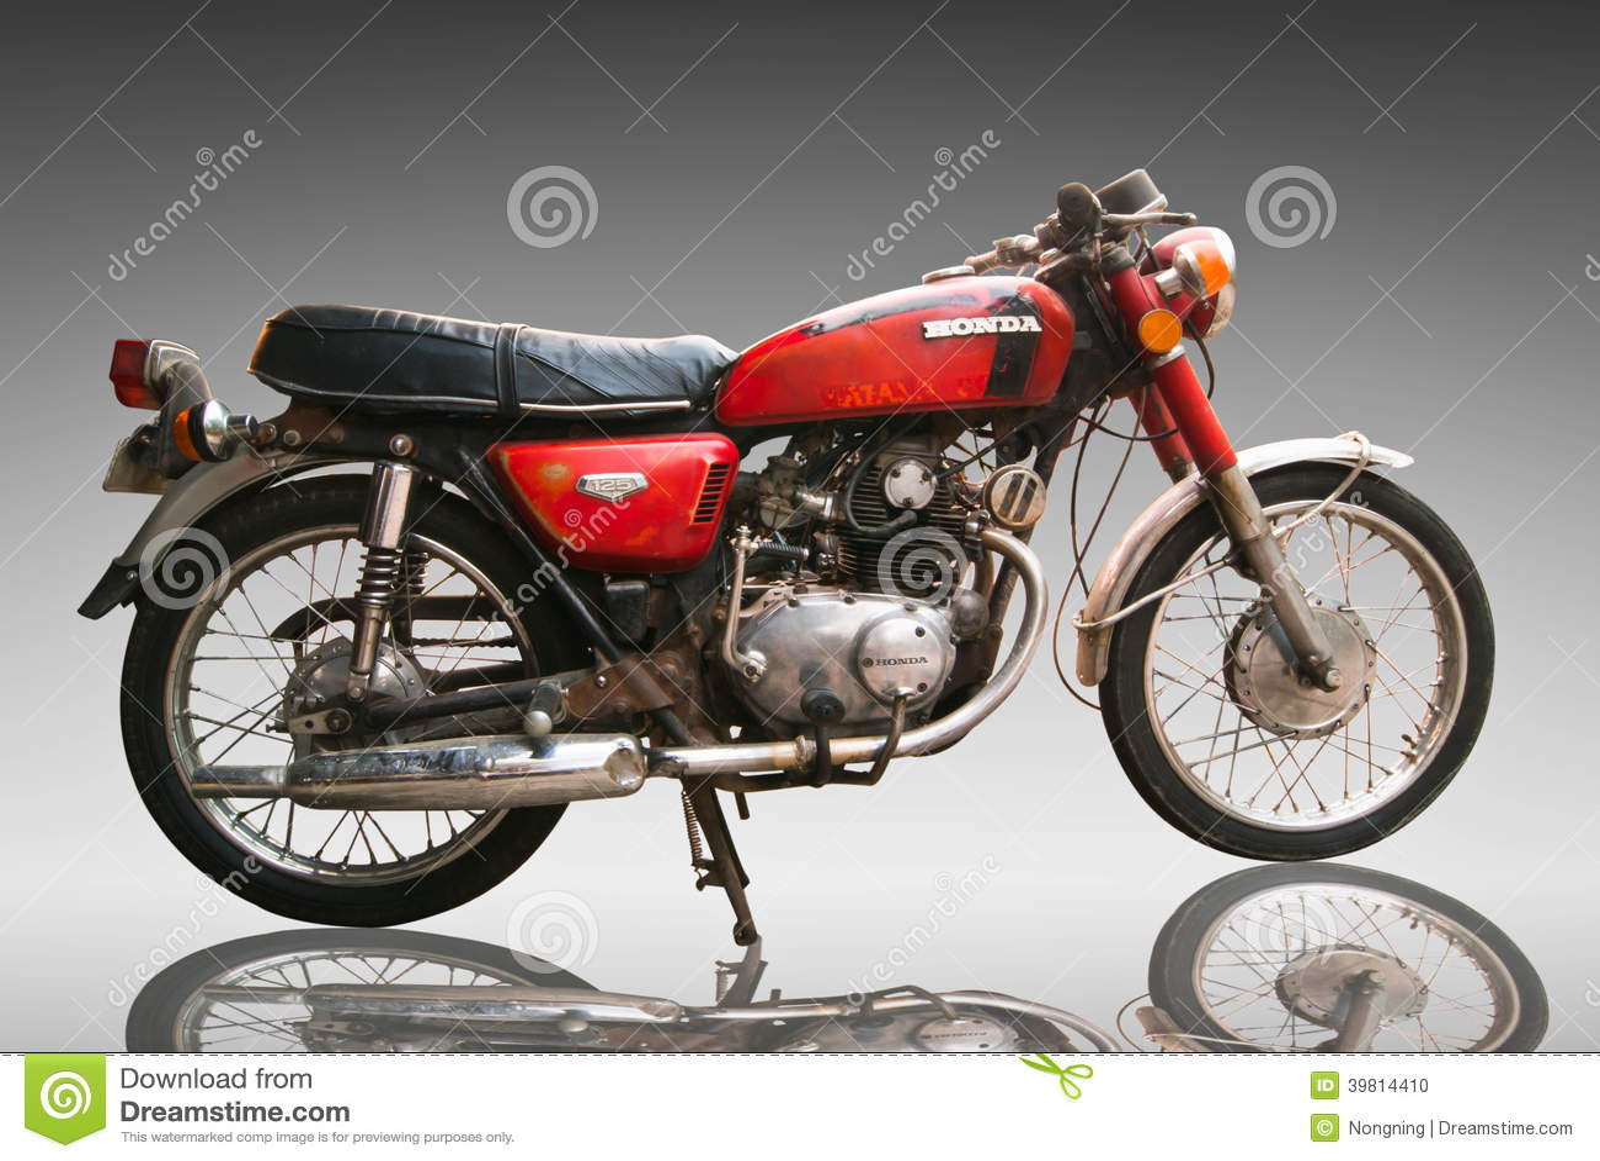 moto classique honda de vintage 125 cc utilisation ditoriale seulement utilisation image. Black Bedroom Furniture Sets. Home Design Ideas